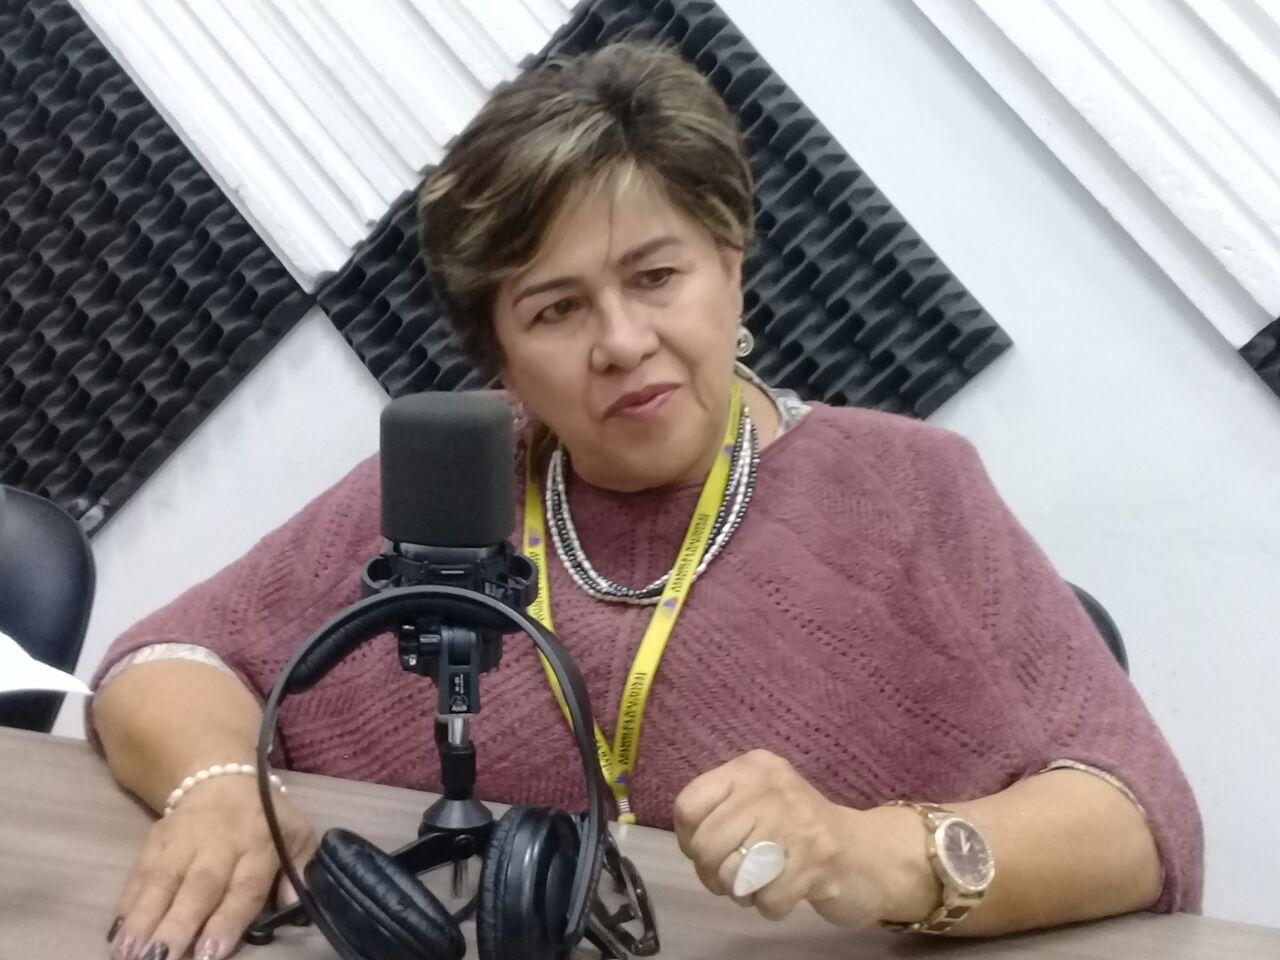 Juan Lloret y Francisca Morejón: Ley para Prevenir la Violencia a la Mujer